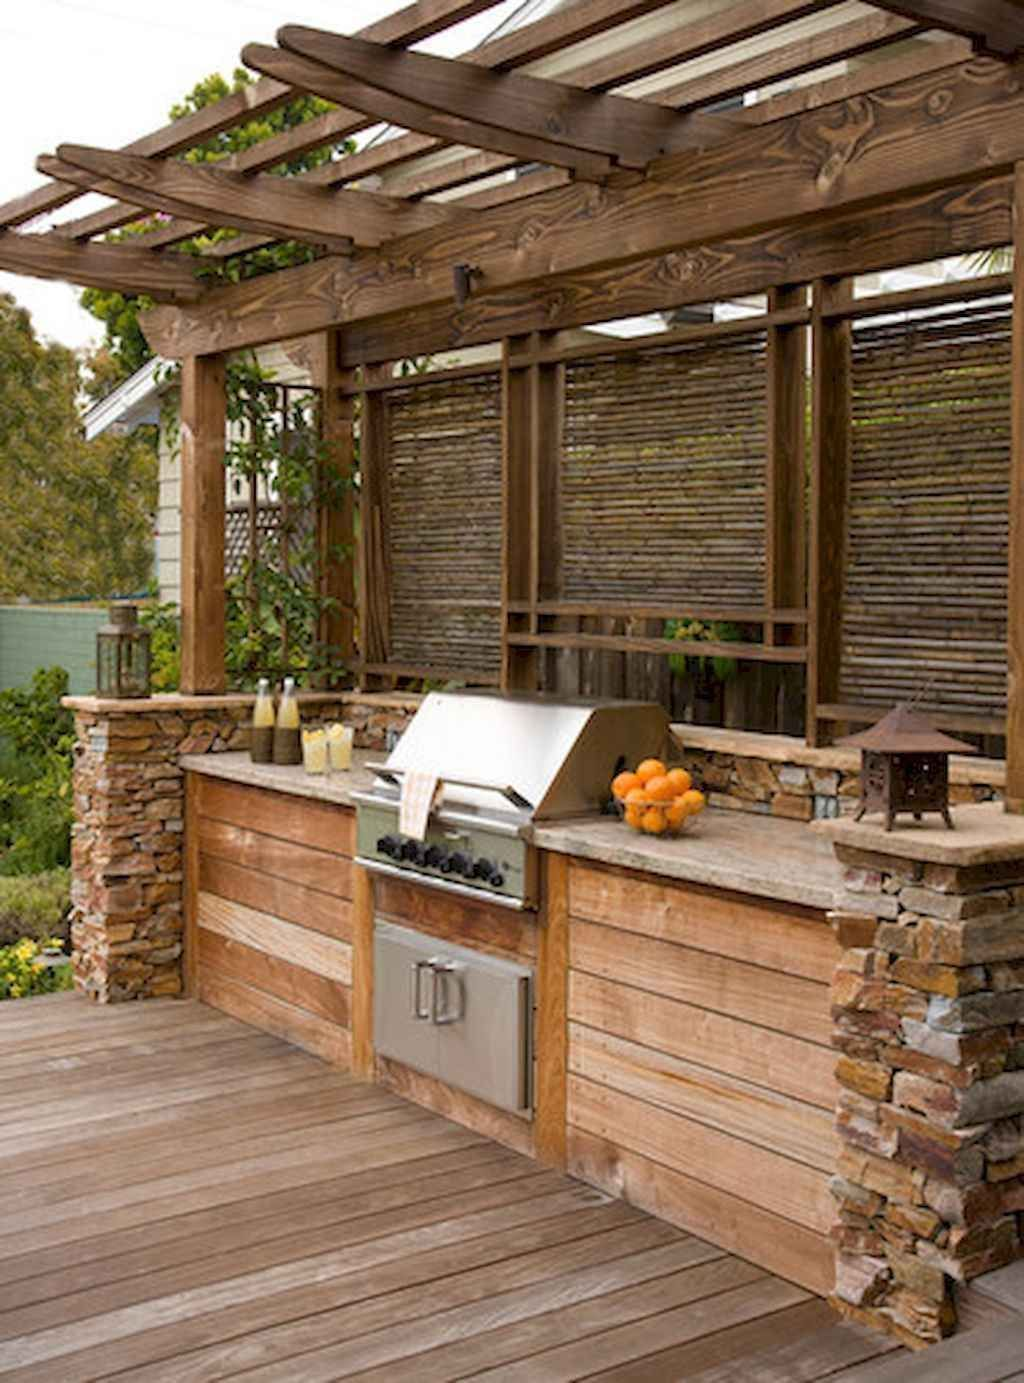 Stunning Outdoor Kitchen Design Ideas For Perfect Summer 04